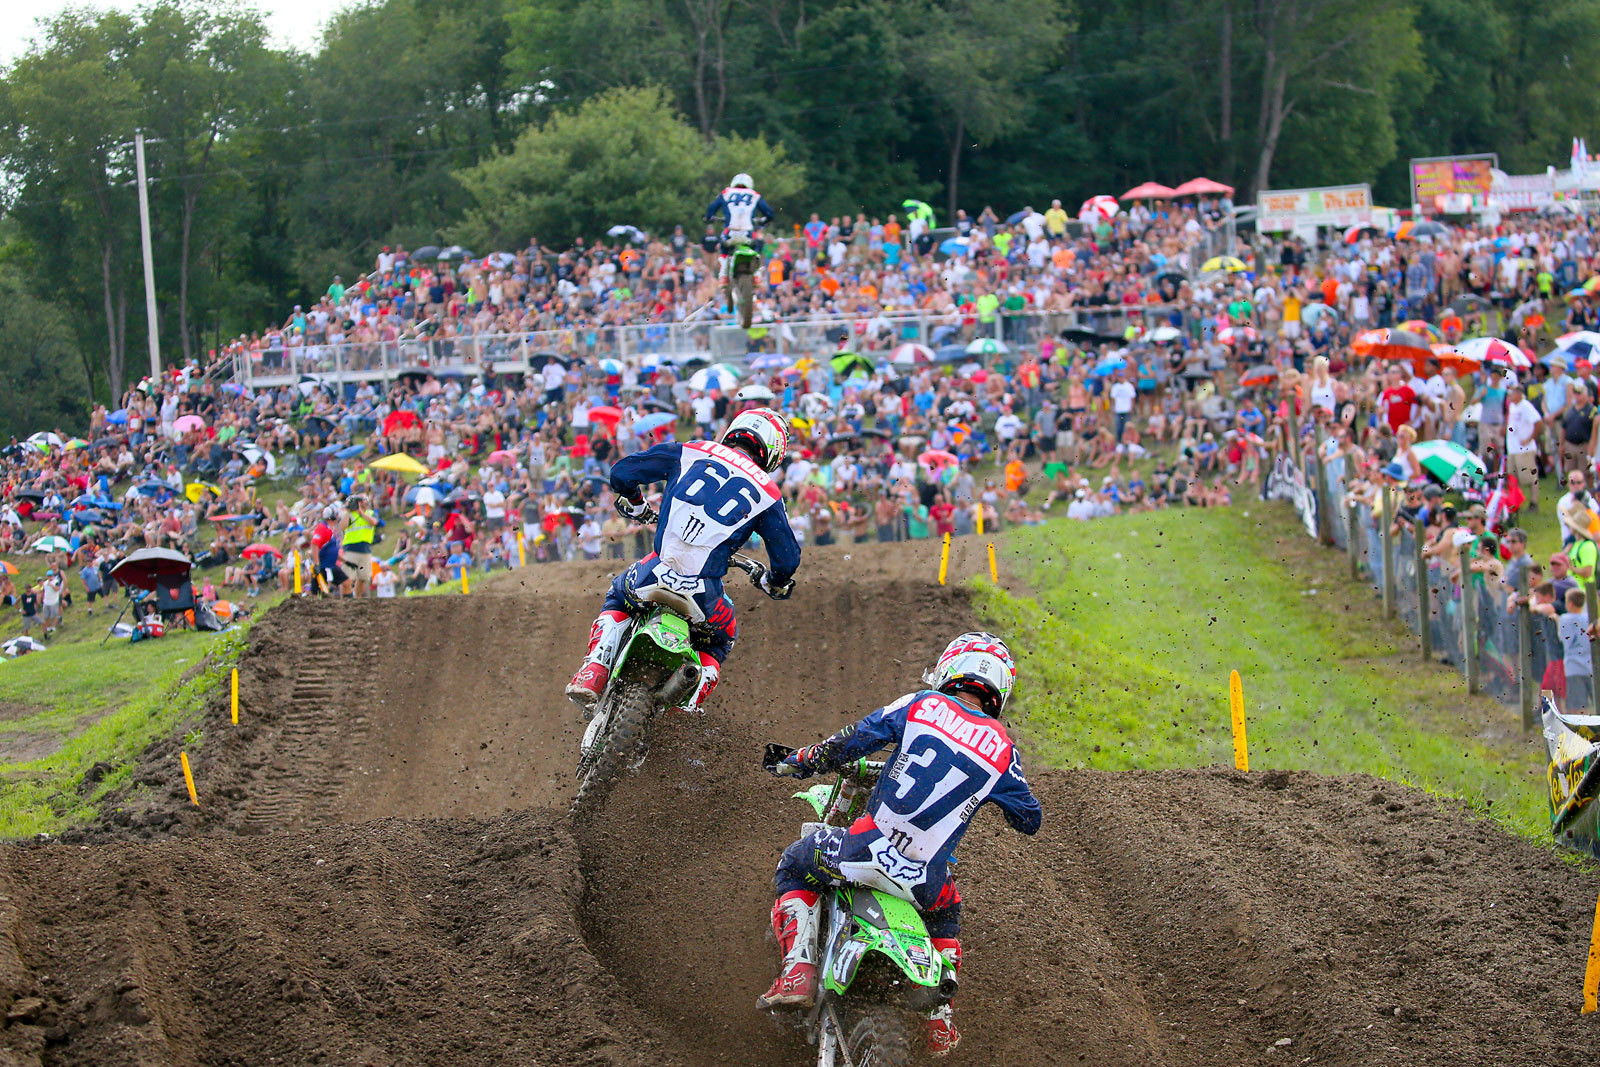 Arnaud Tonus and Joey Savatgy - GuyB - Motocross Pictures - Vital MX